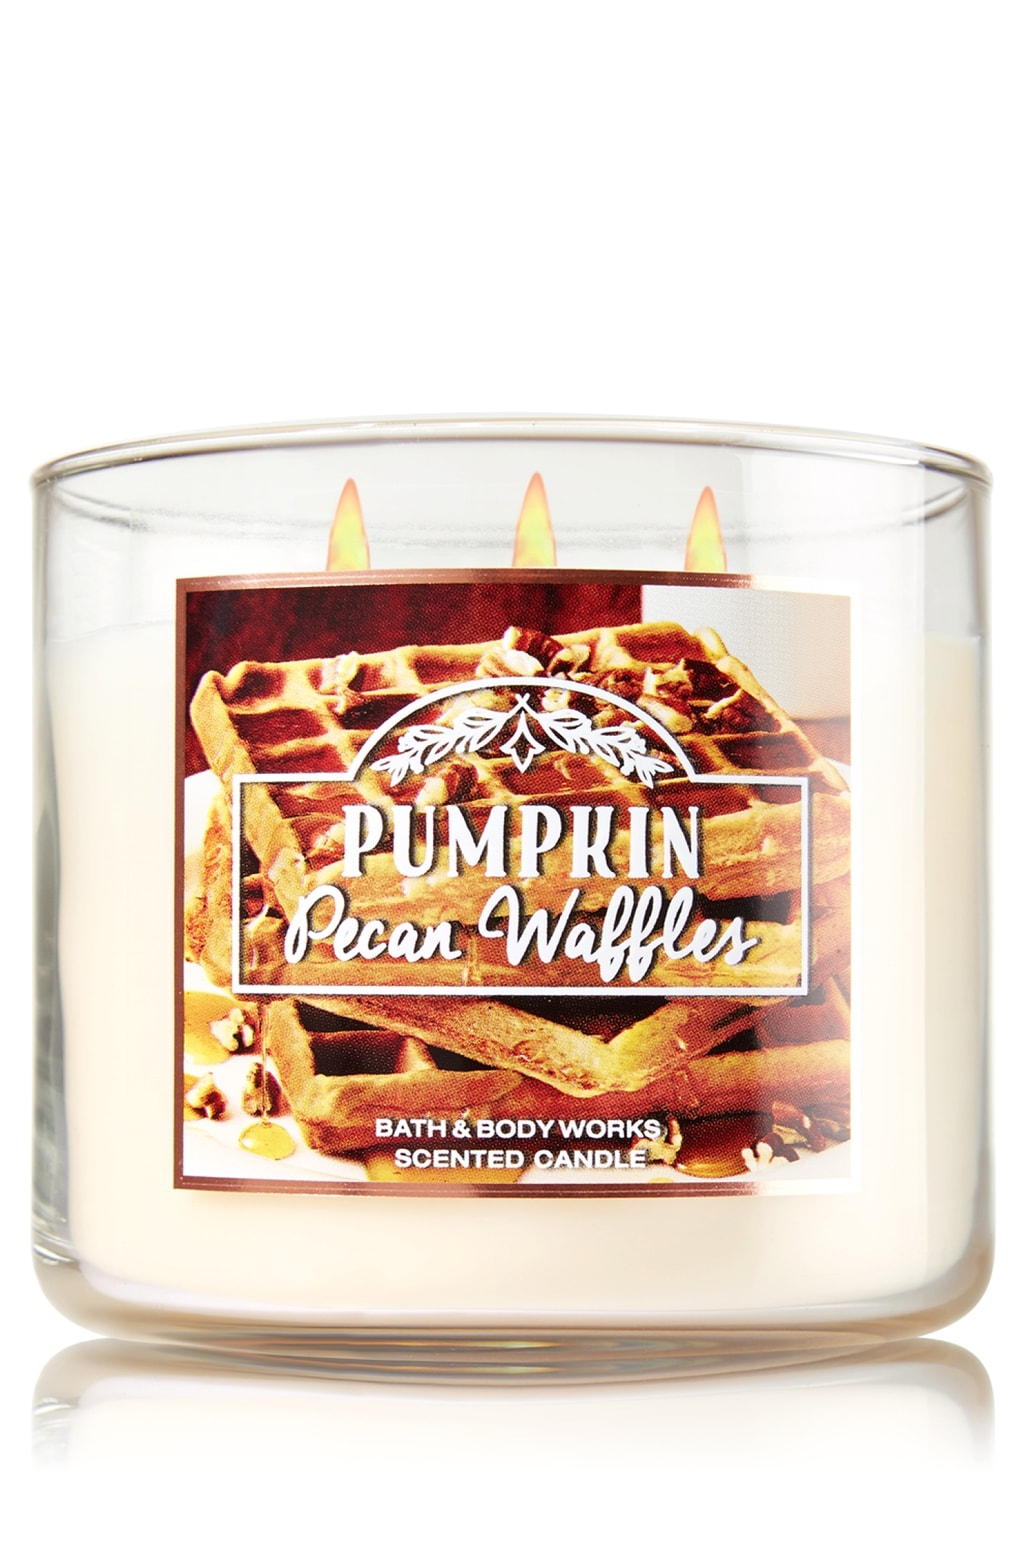 Pumpkin pecan waffles candle